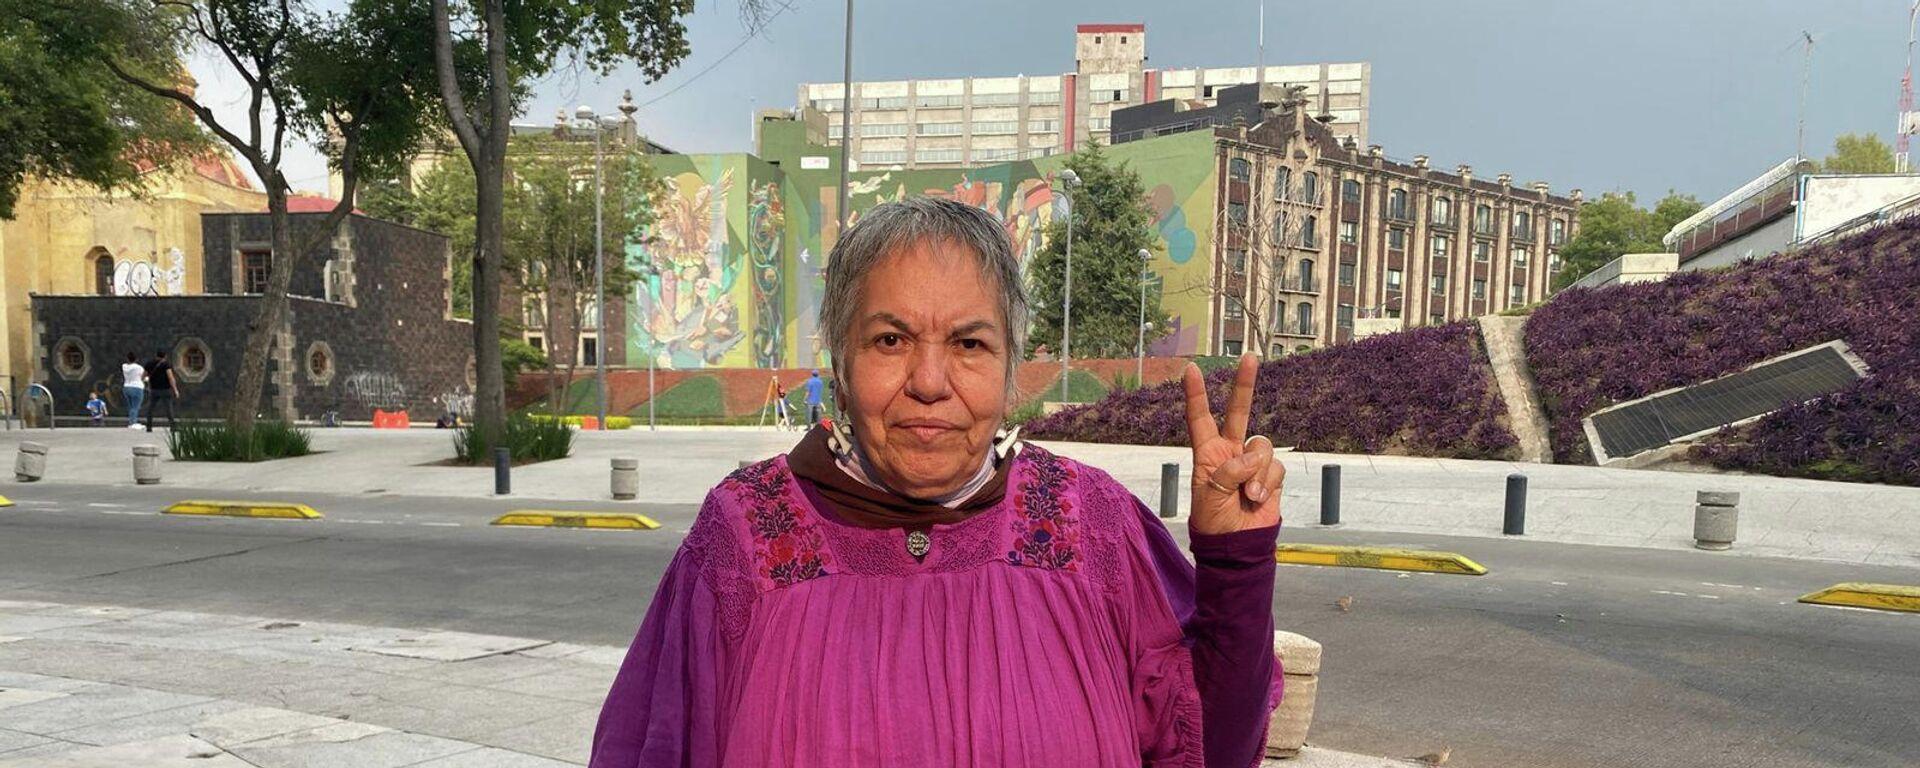 Ana Ignacia Rodríguez, líder estudiantil de movimiento del 68  - Sputnik Mundo, 1920, 02.10.2021